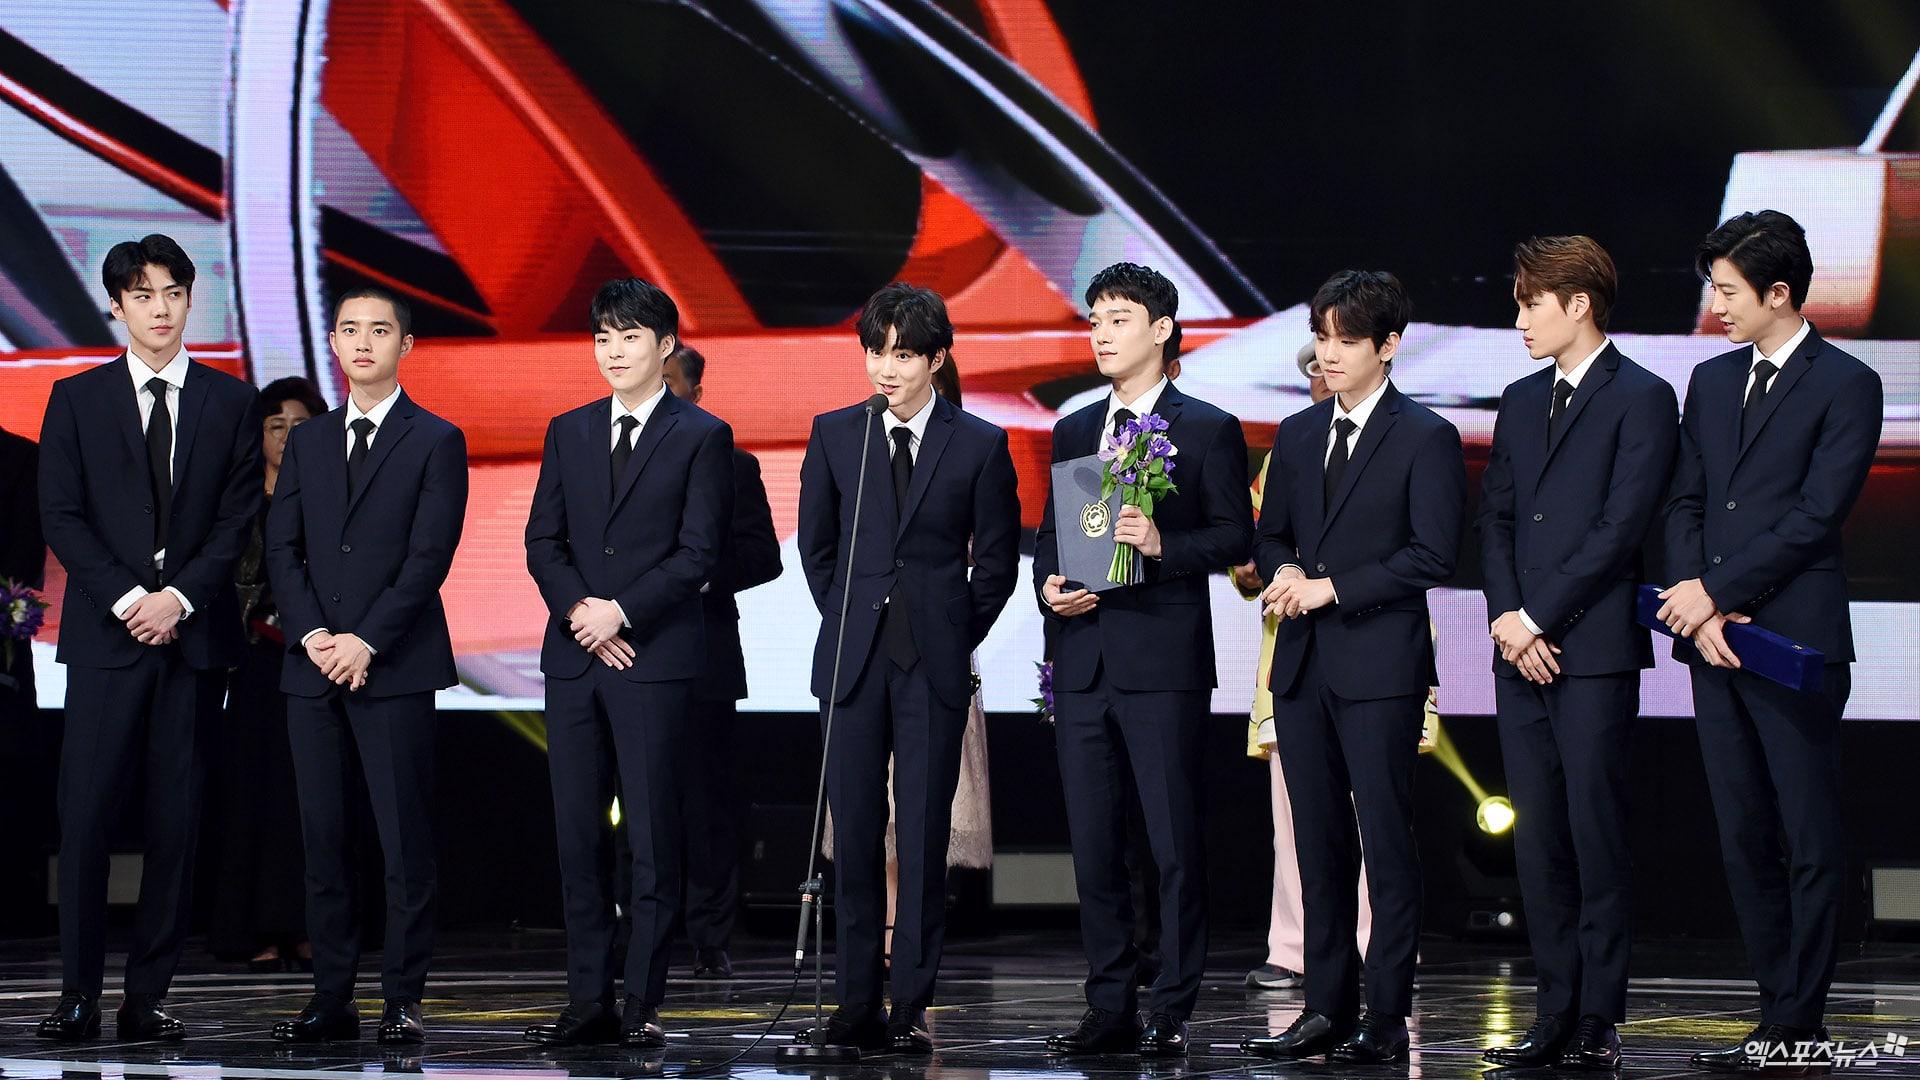 https: img.okezone.com content 2017 11 04 33 1808460 exo-park-bo-gum-park-bo-young-raih-penghargaan-di-korean-popular-culture-arts-awards-2017-zcKHMn7ug9.jpg